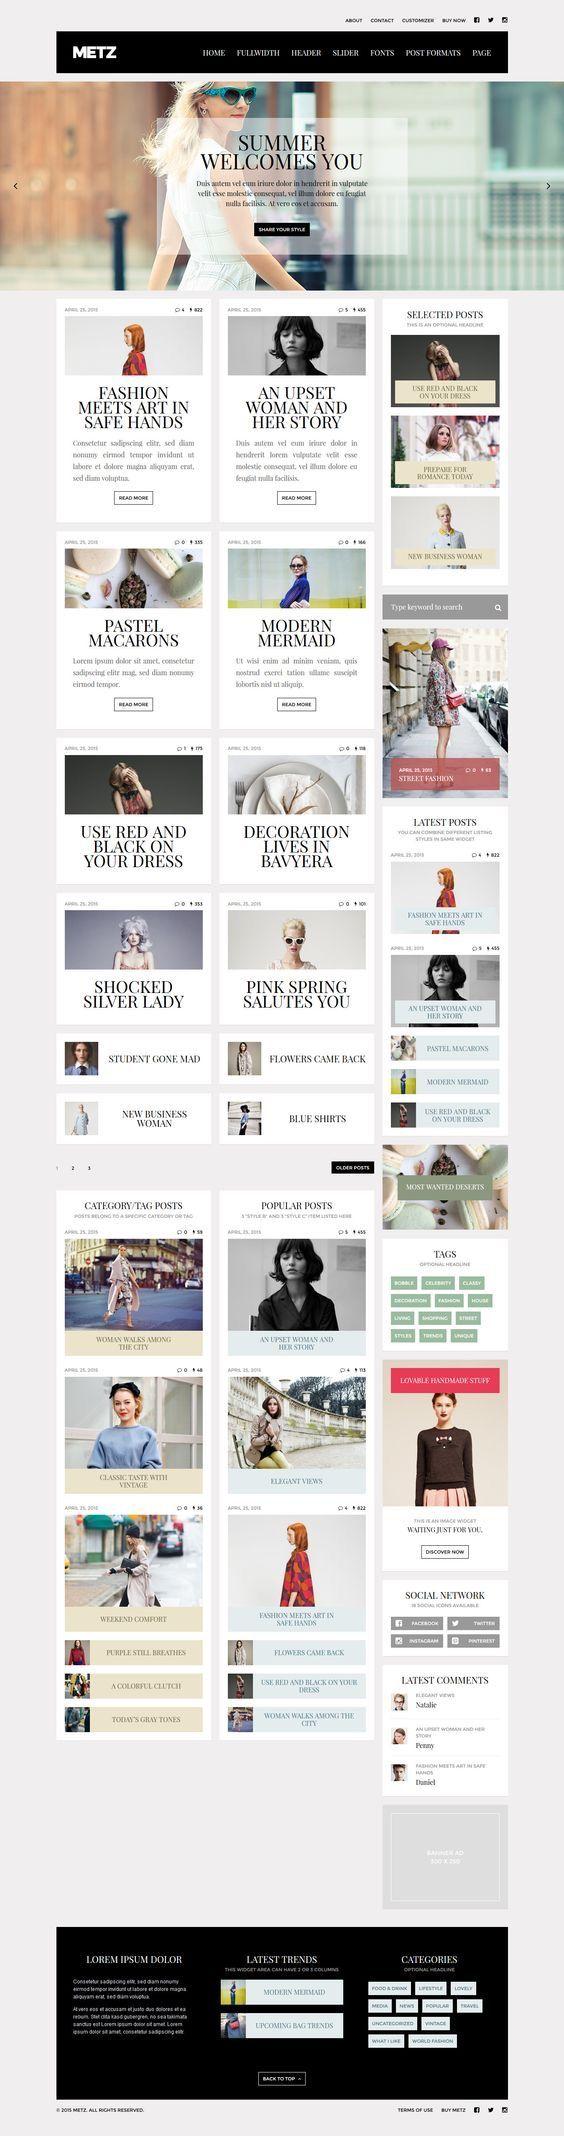 65 best Blog Template Inspiration images on Pinterest | Website ...